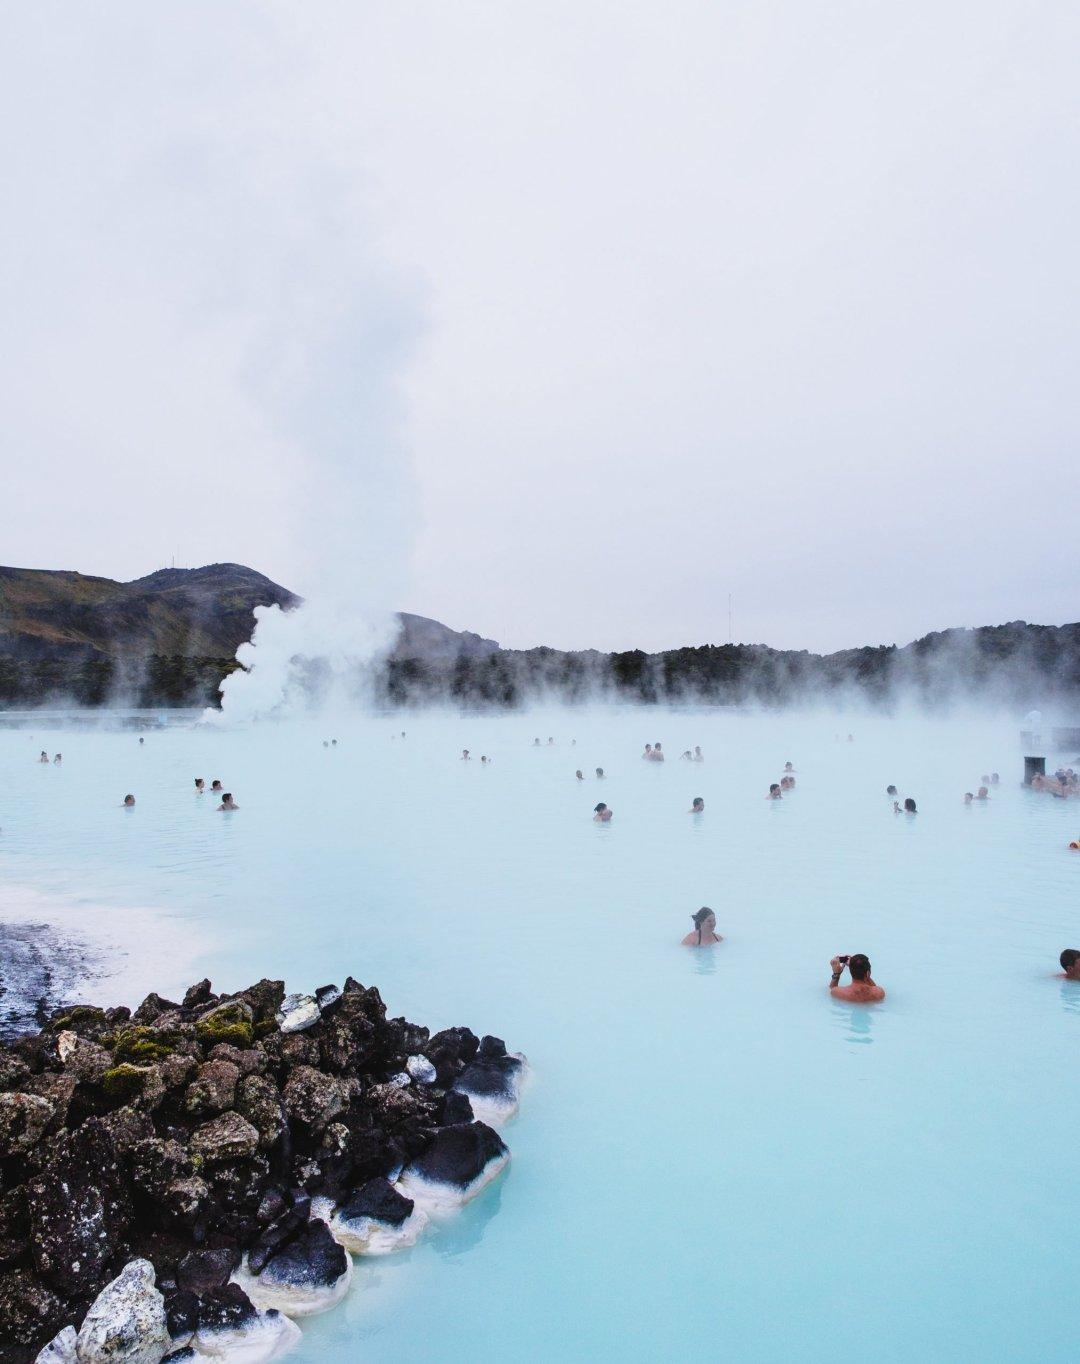 Iceland GGI 2